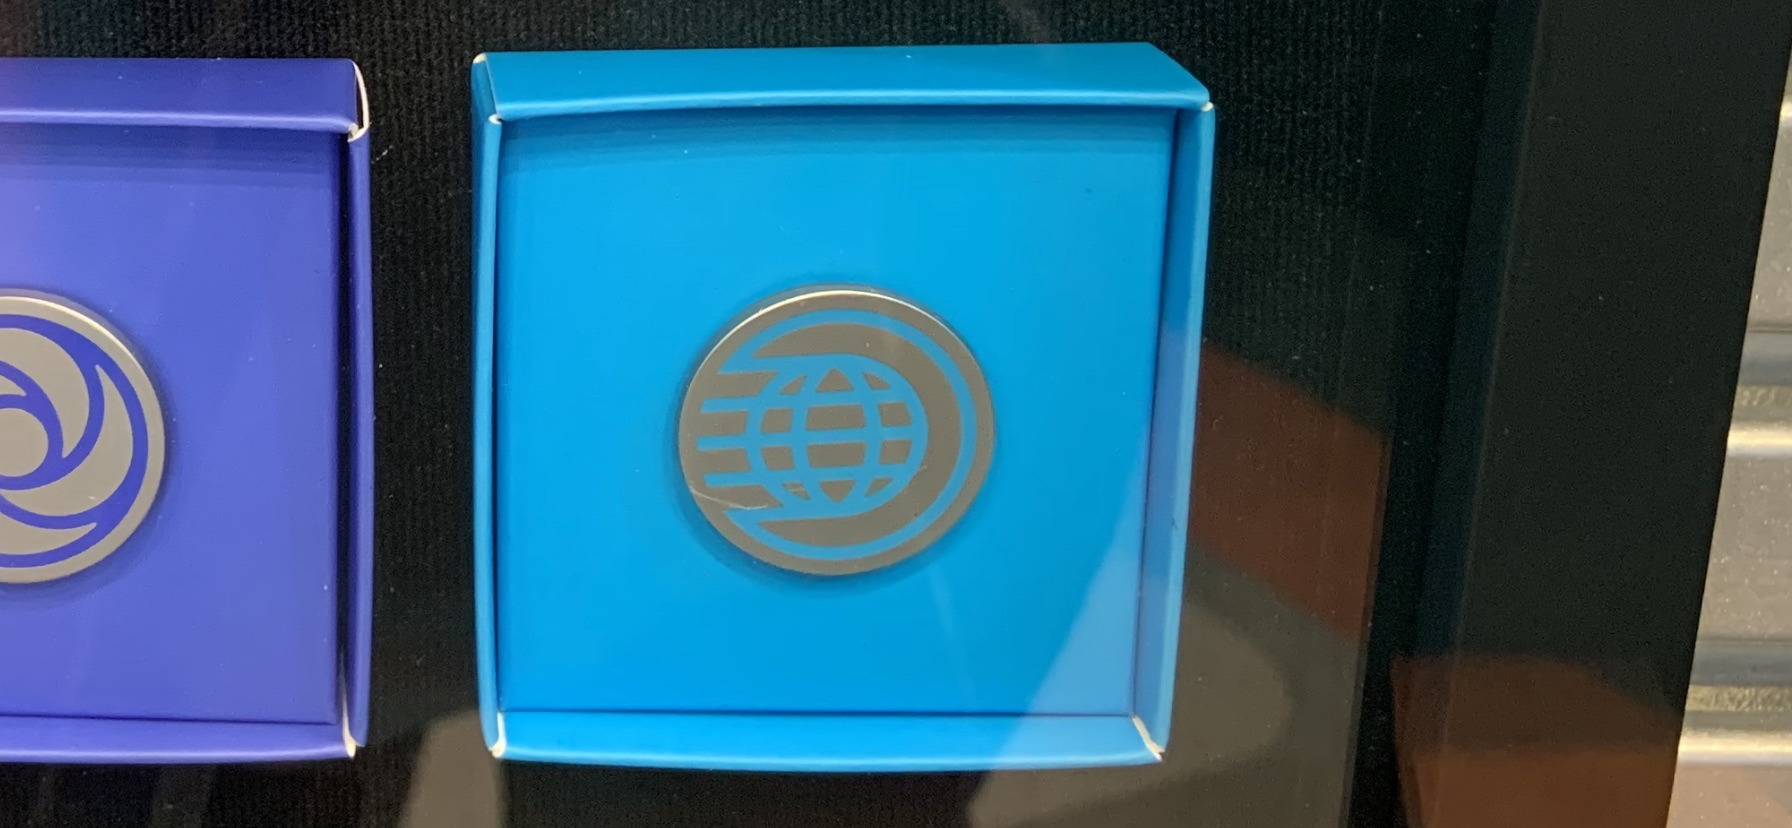 EPCOT pavilion logo pins 12/23/19 15